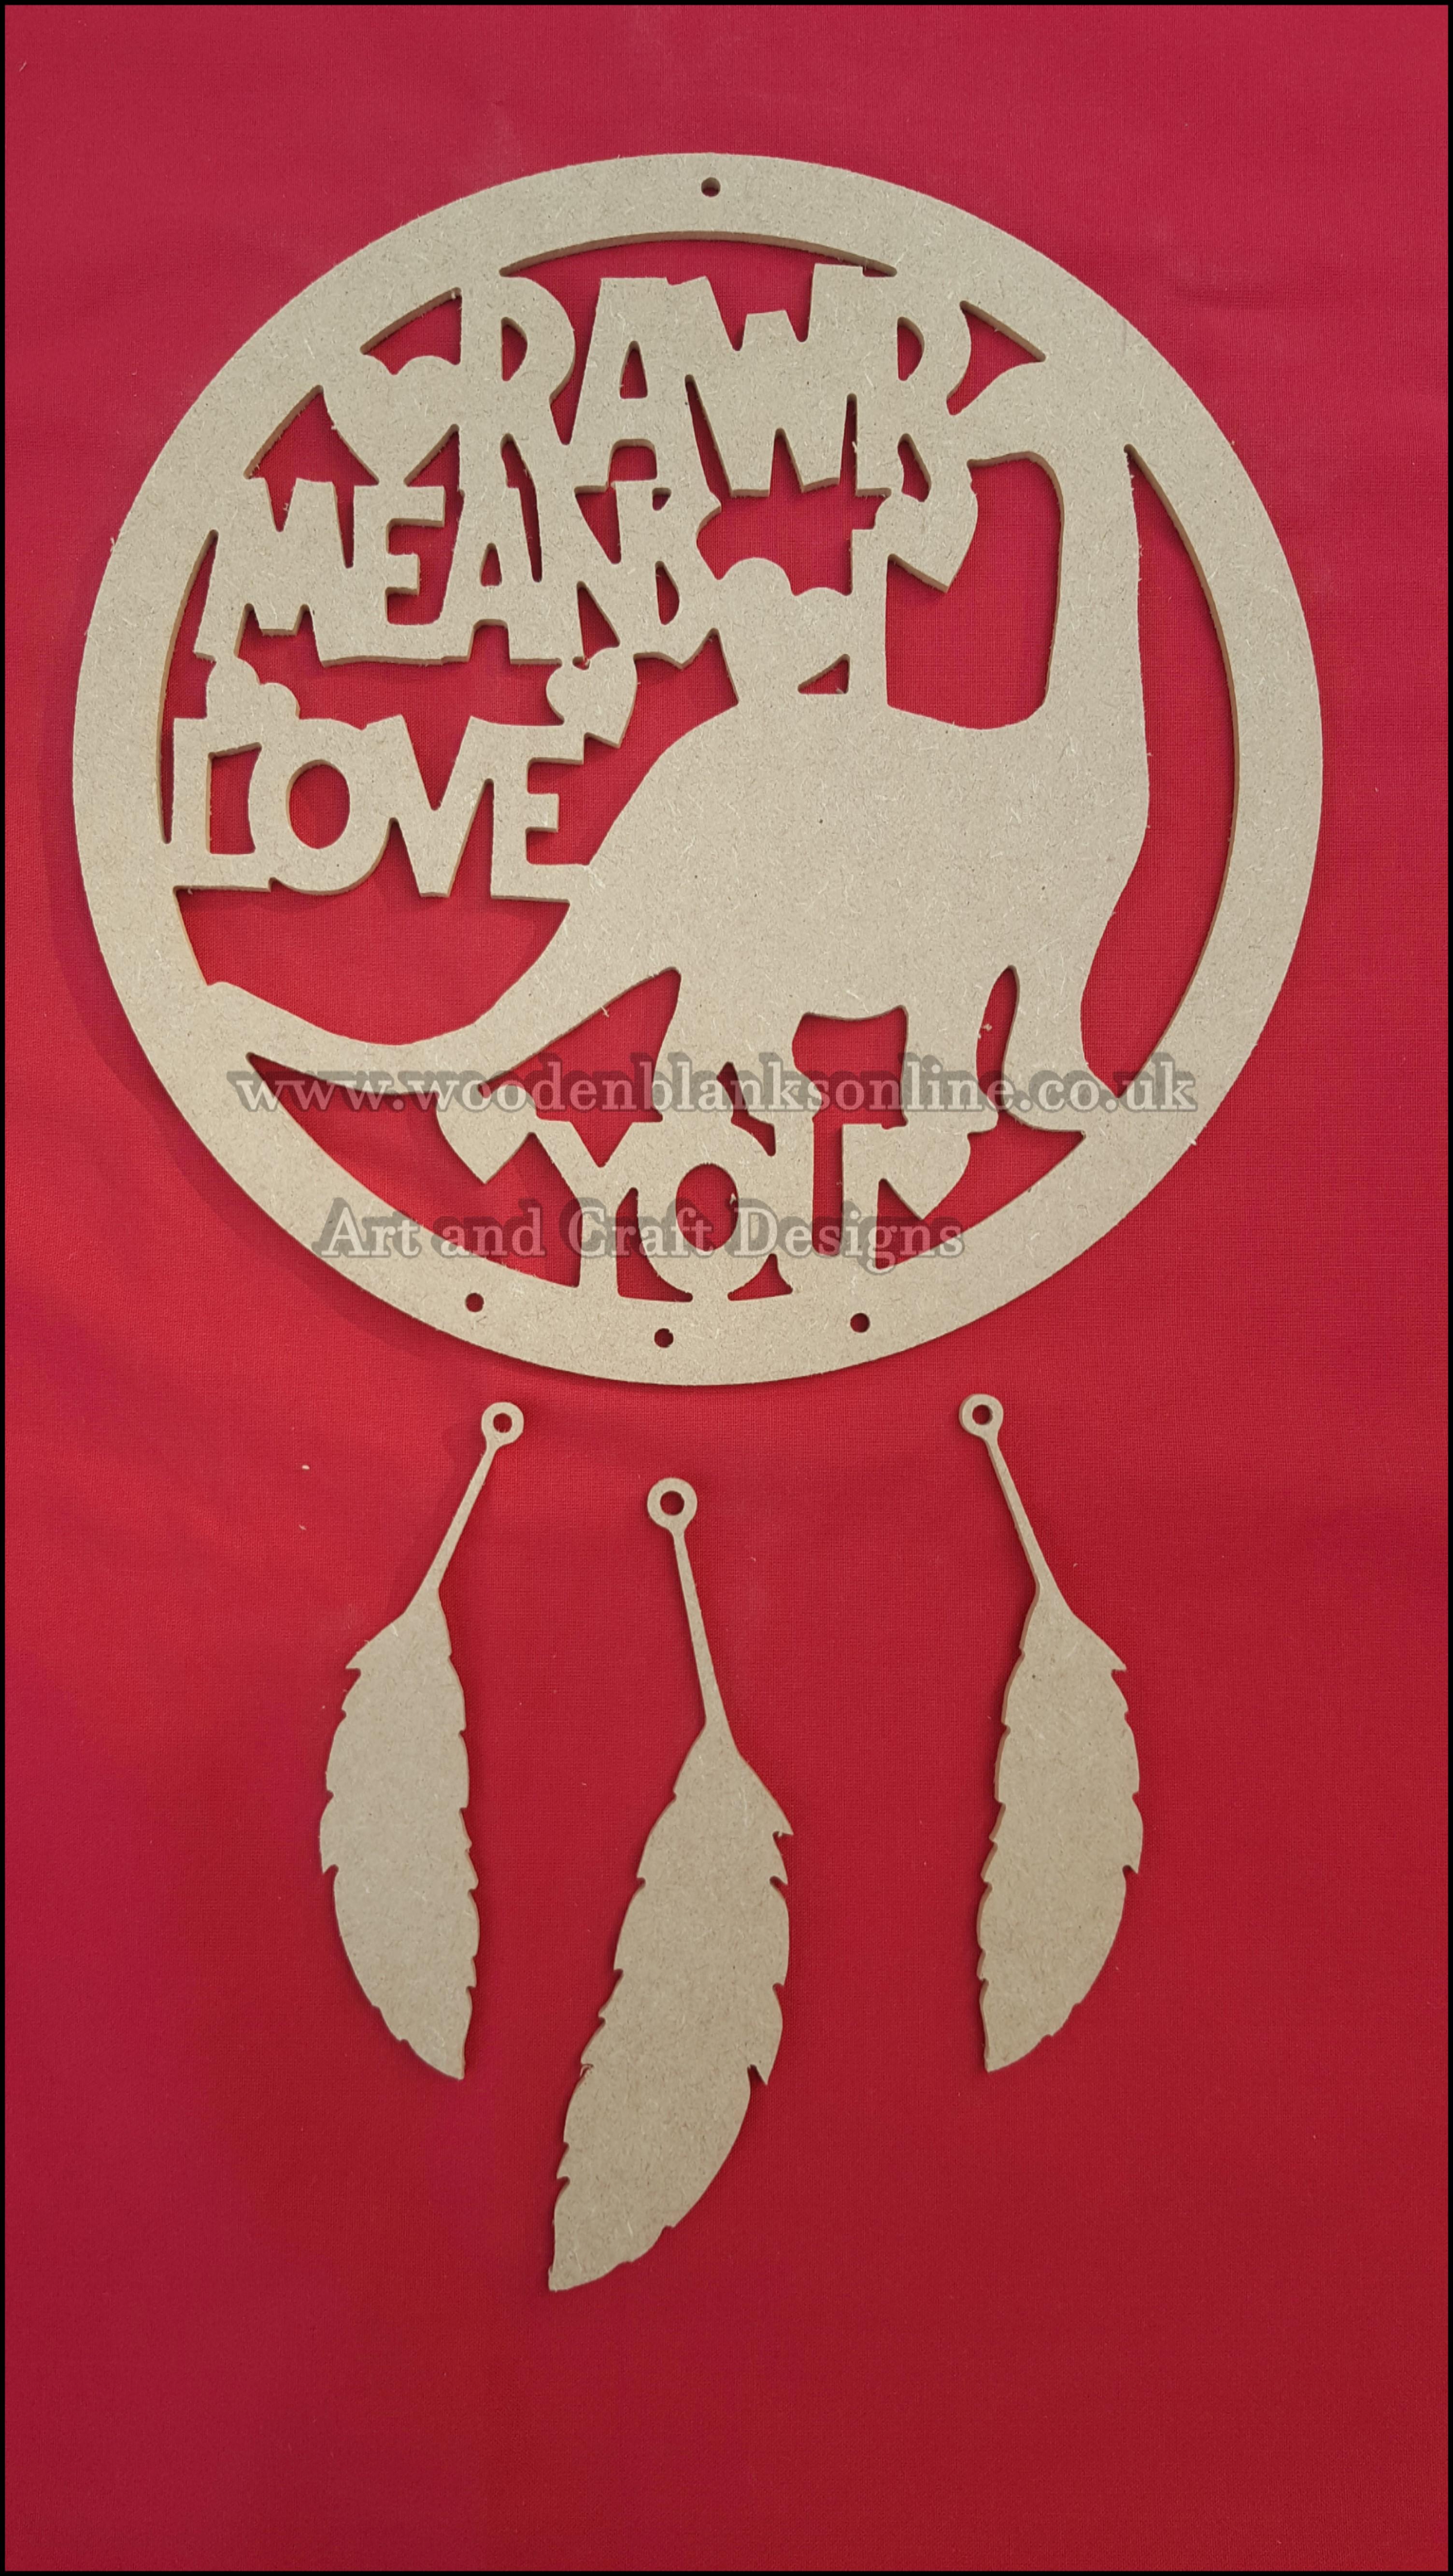 Rawr love